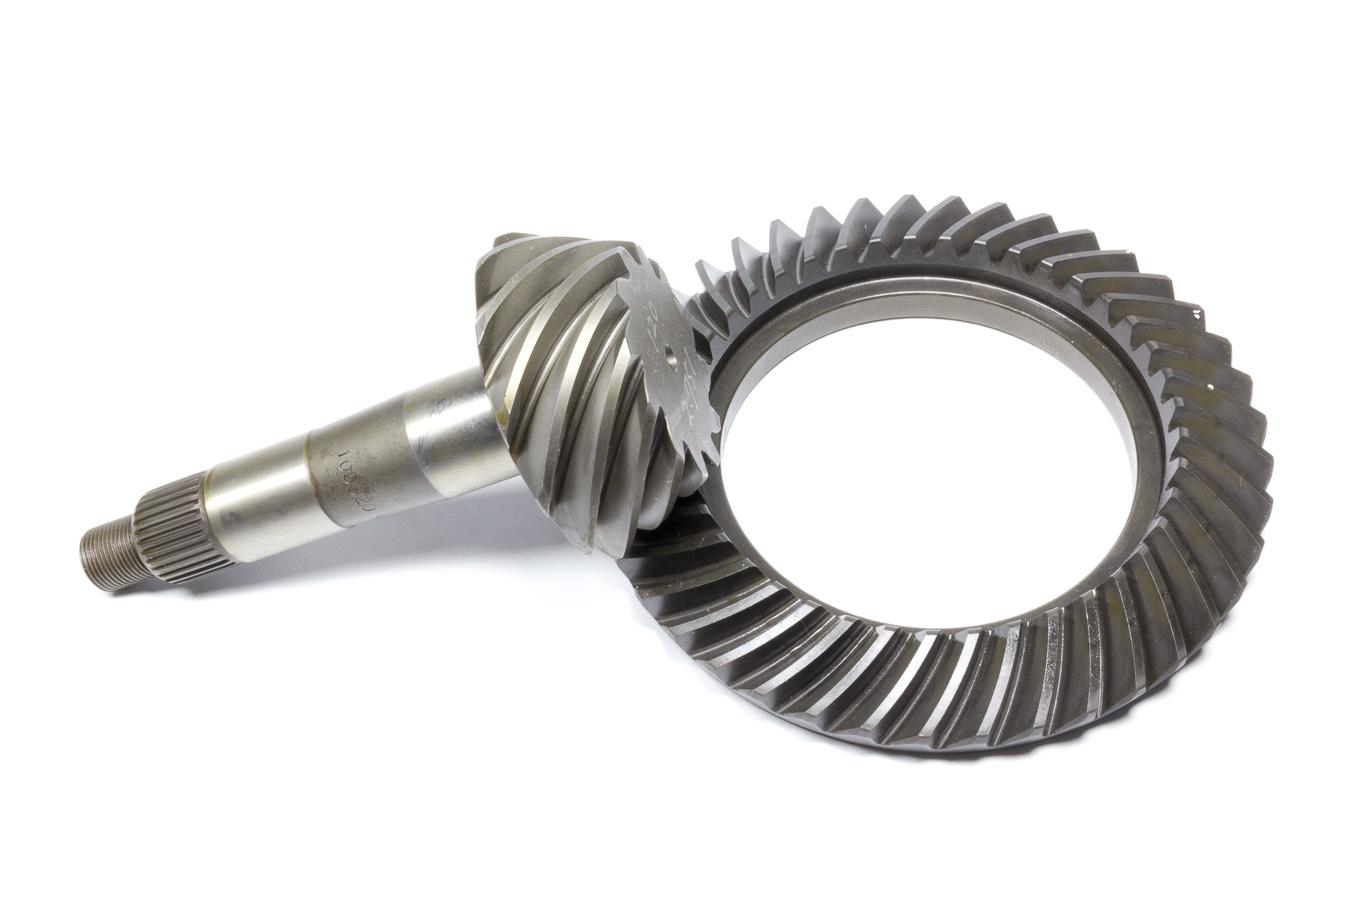 Motive Gear GM12-342 Ring and Pinion, 3.42 Ratio, 30 Spline Pinion, 8.875 in, GM 12-Bolt, Kit